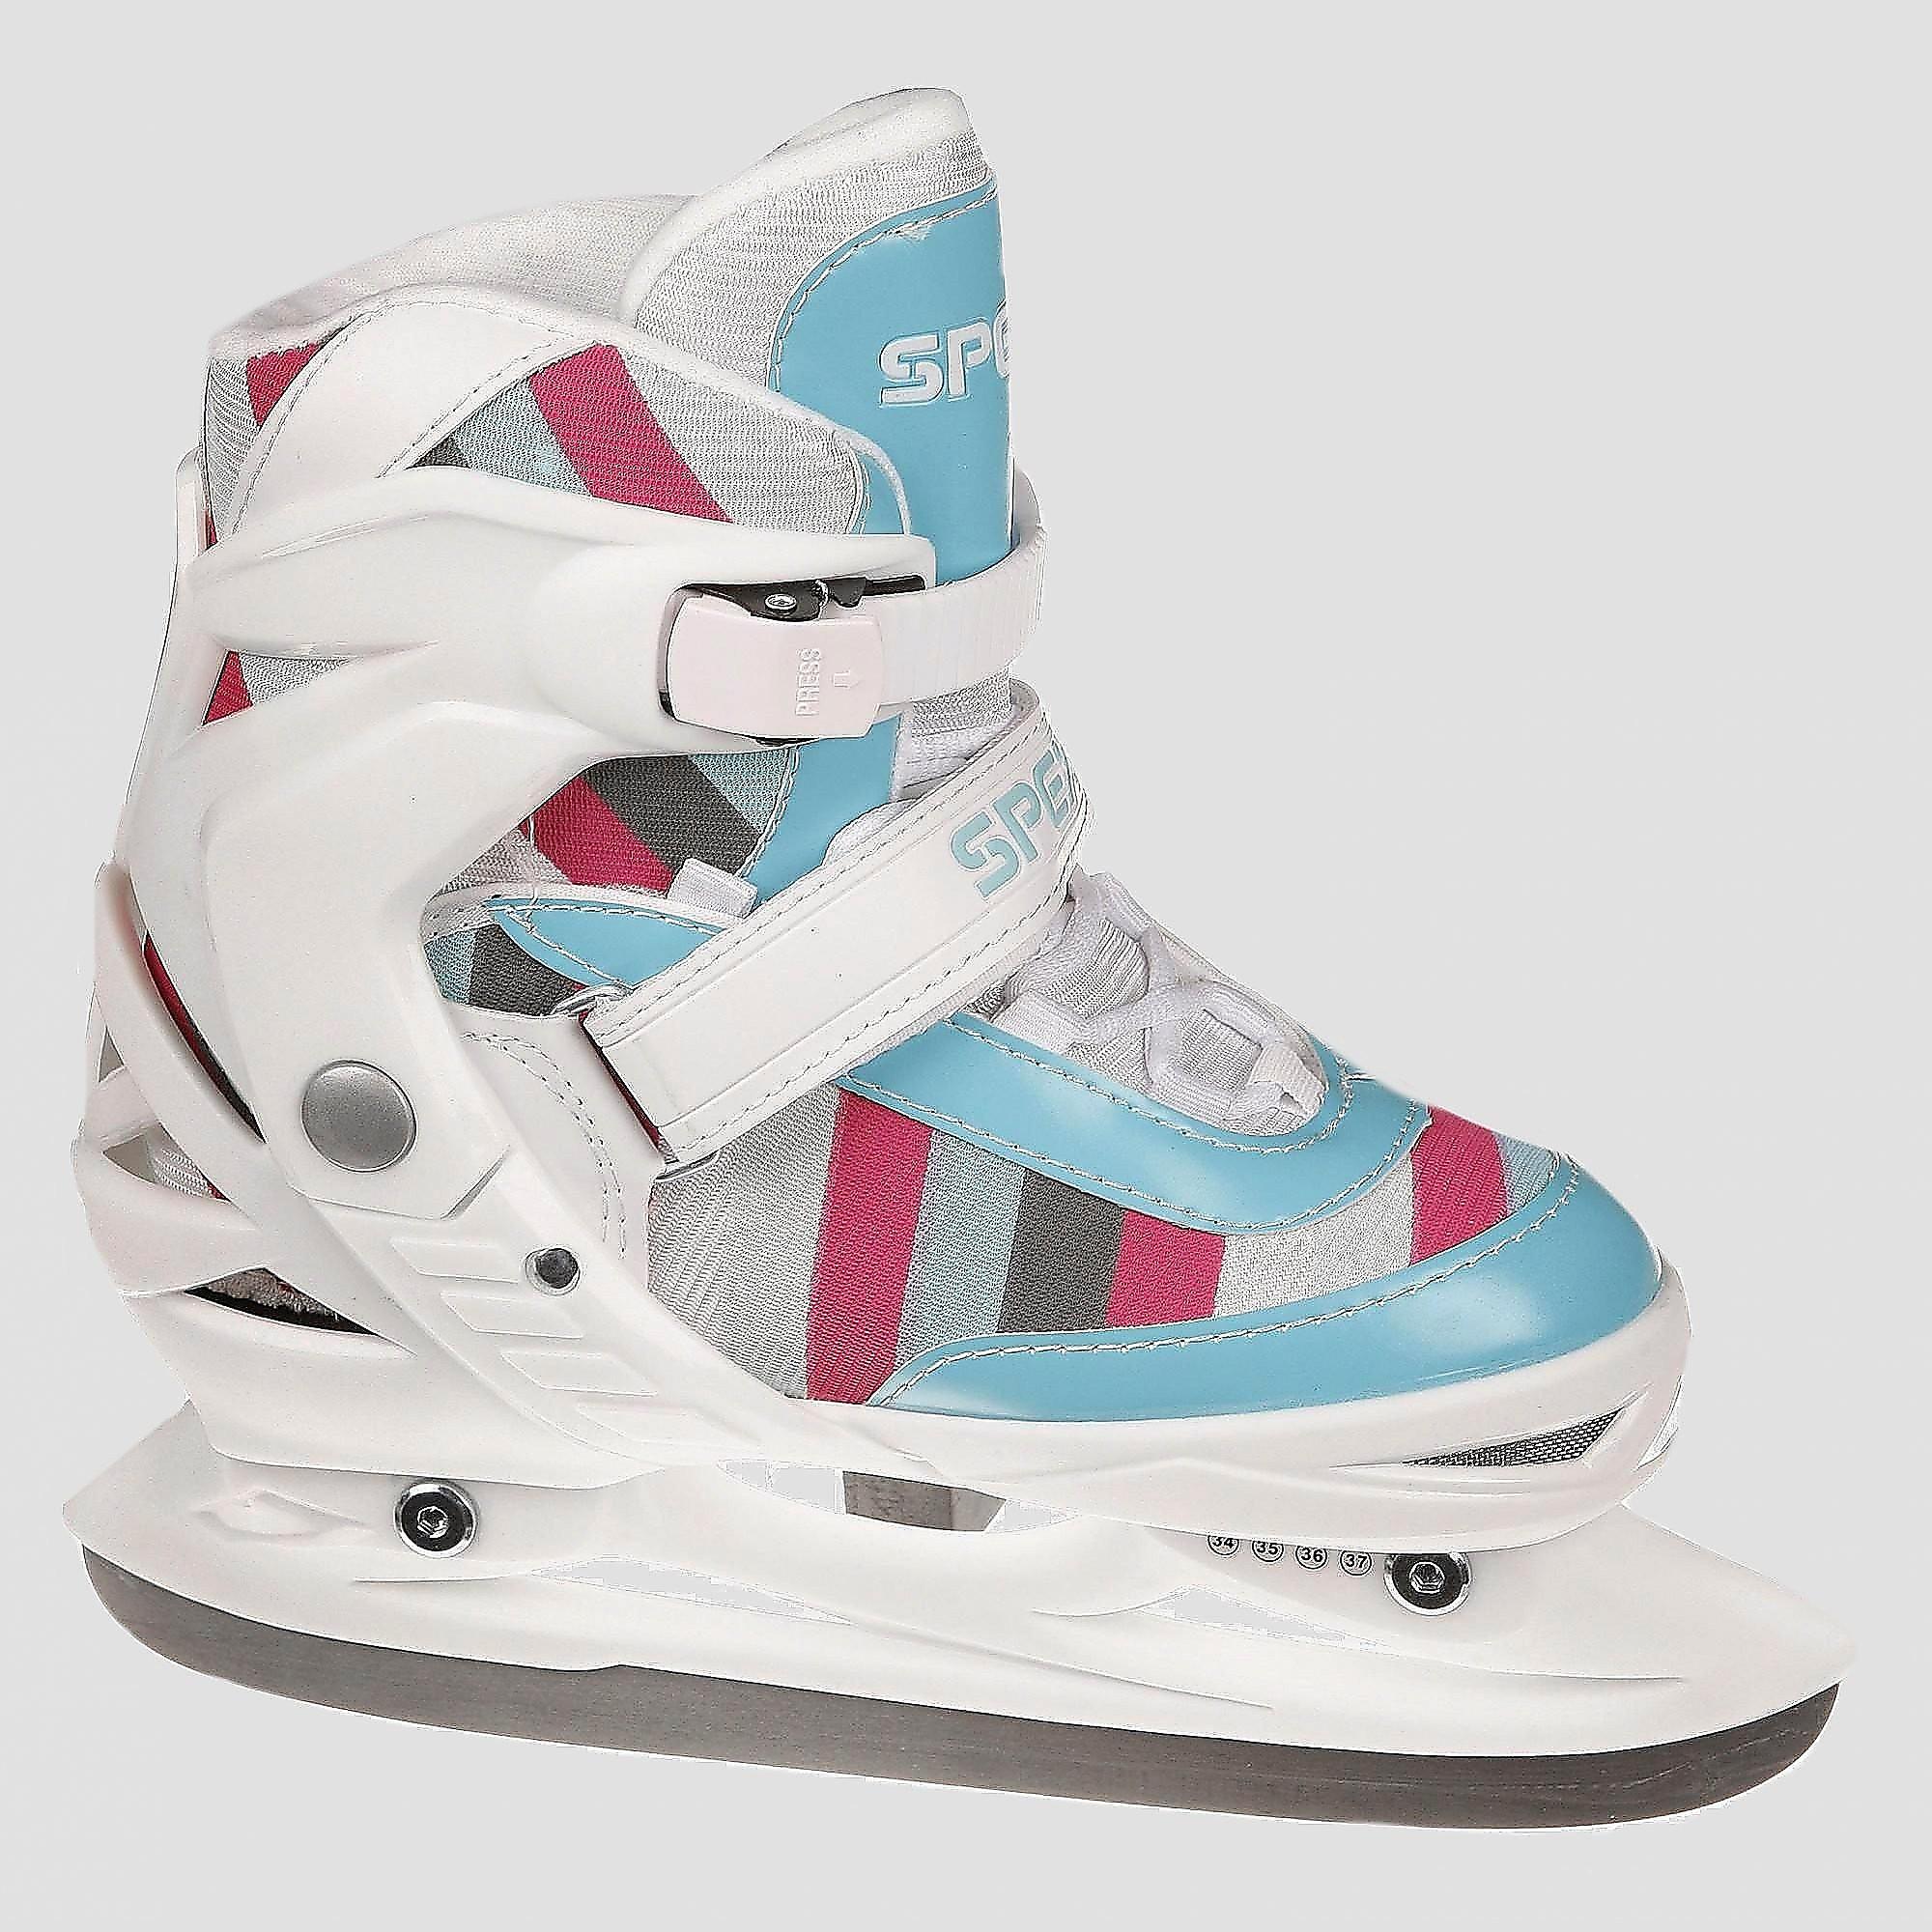 SPEX ICE JR